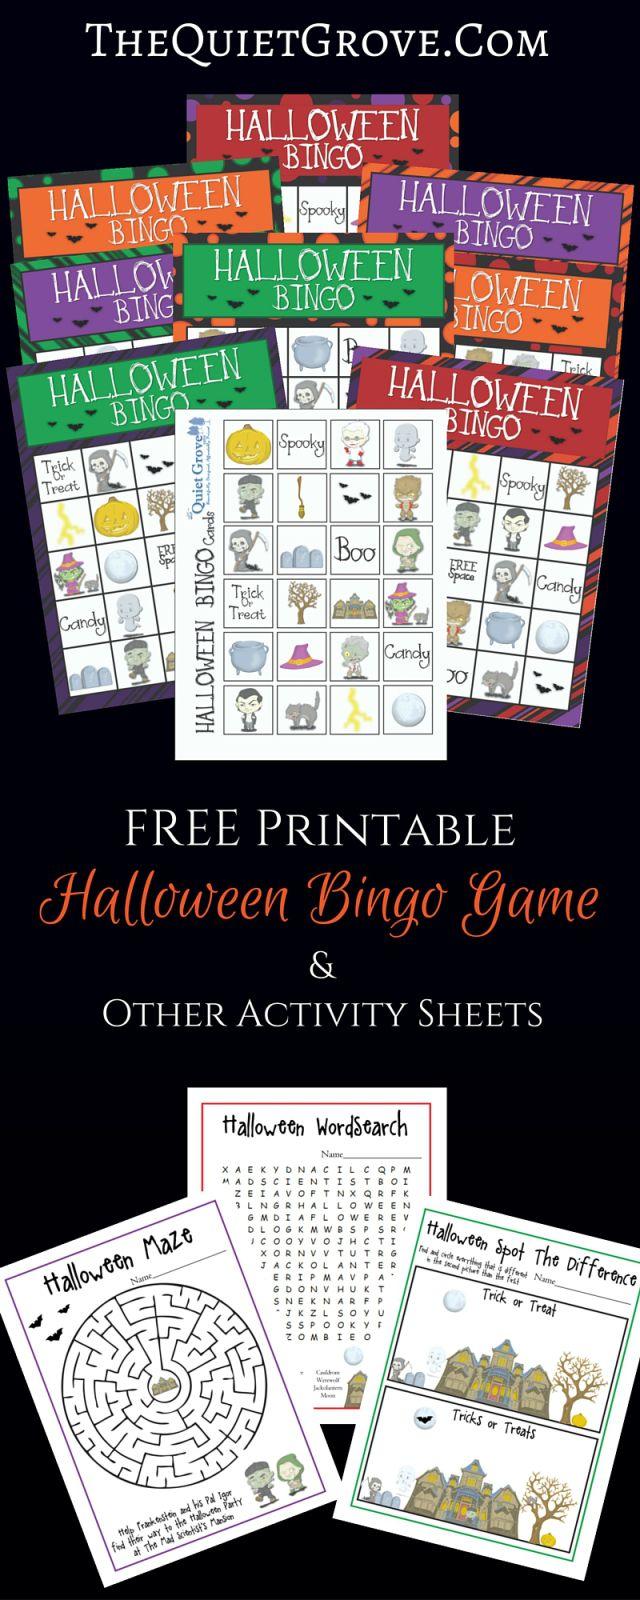 free printable halloween bingo game other activity sheets - Free Printable Halloween Bingo Game Cards